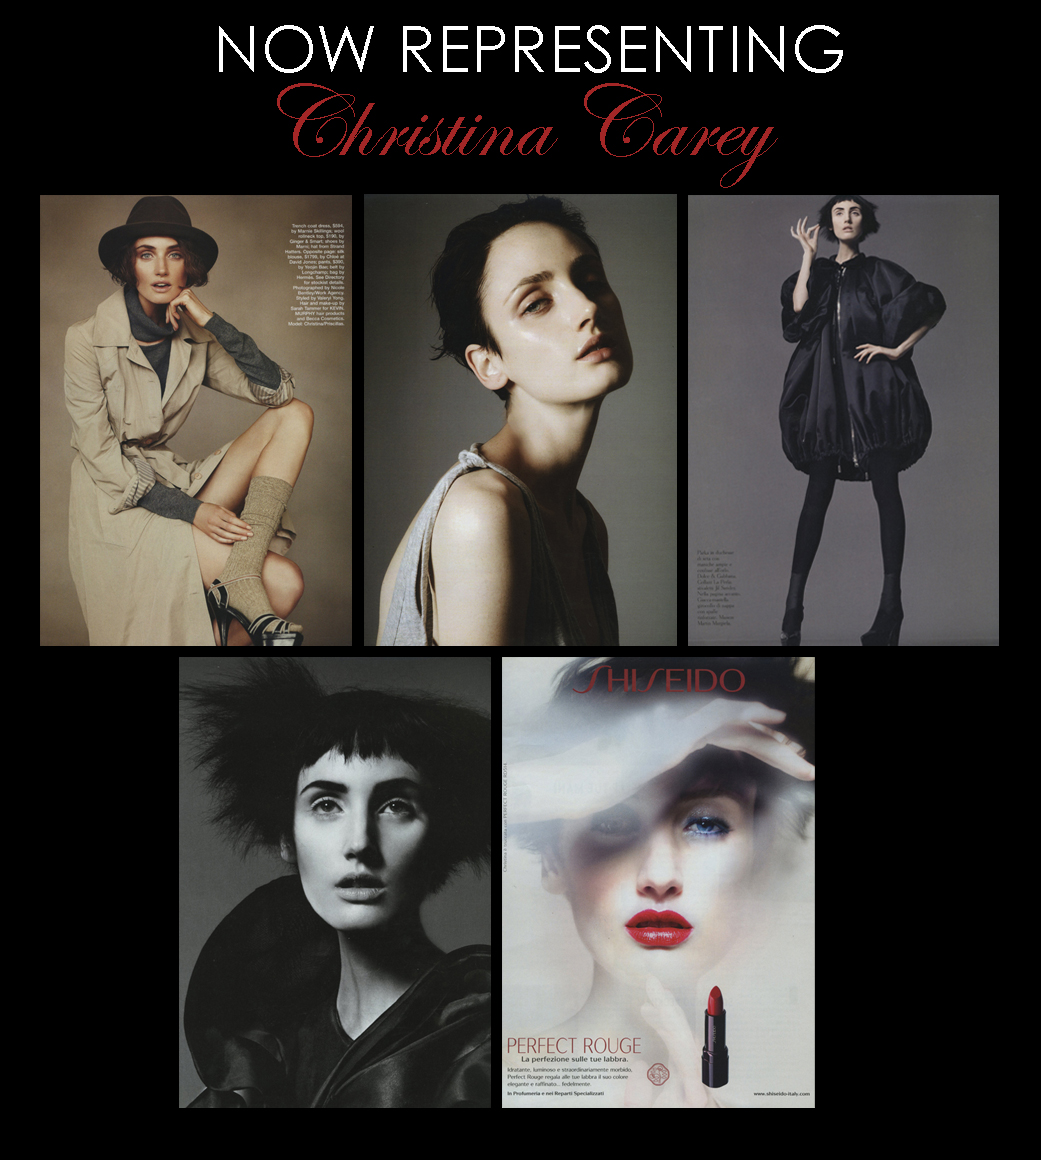 http://3.bp.blogspot.com/_RKYlrNXYQl8/TNN03U-ZkHI/AAAAAAAABL4/OFXEAEUDwKc/s1600/Now+representing-Christina+Carey.jpg